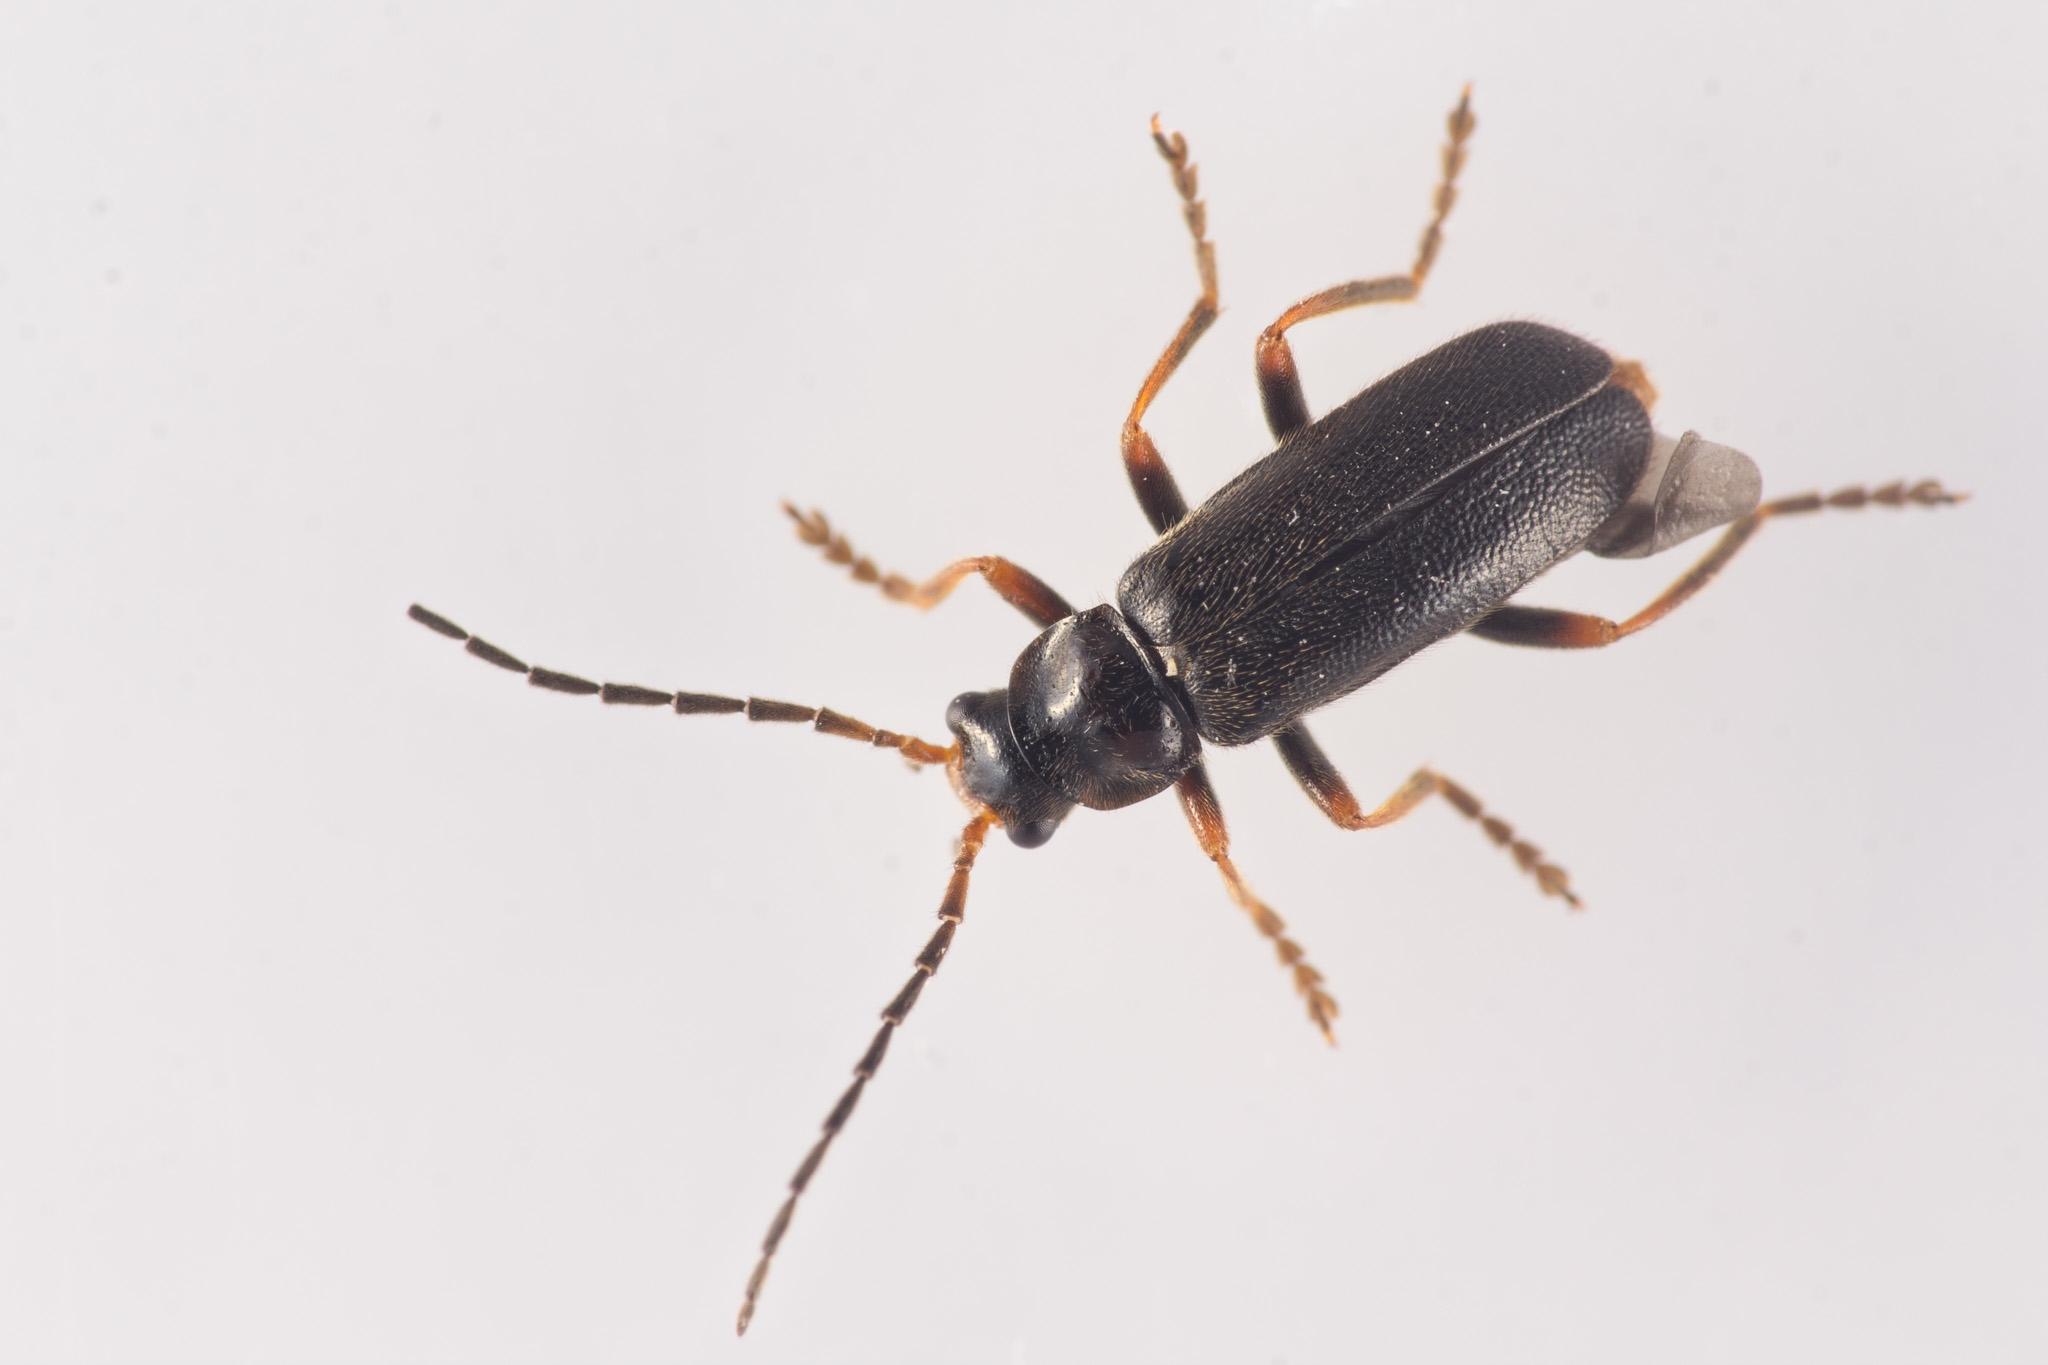 Cantharis flavilabris (Cantharis flavilabris)